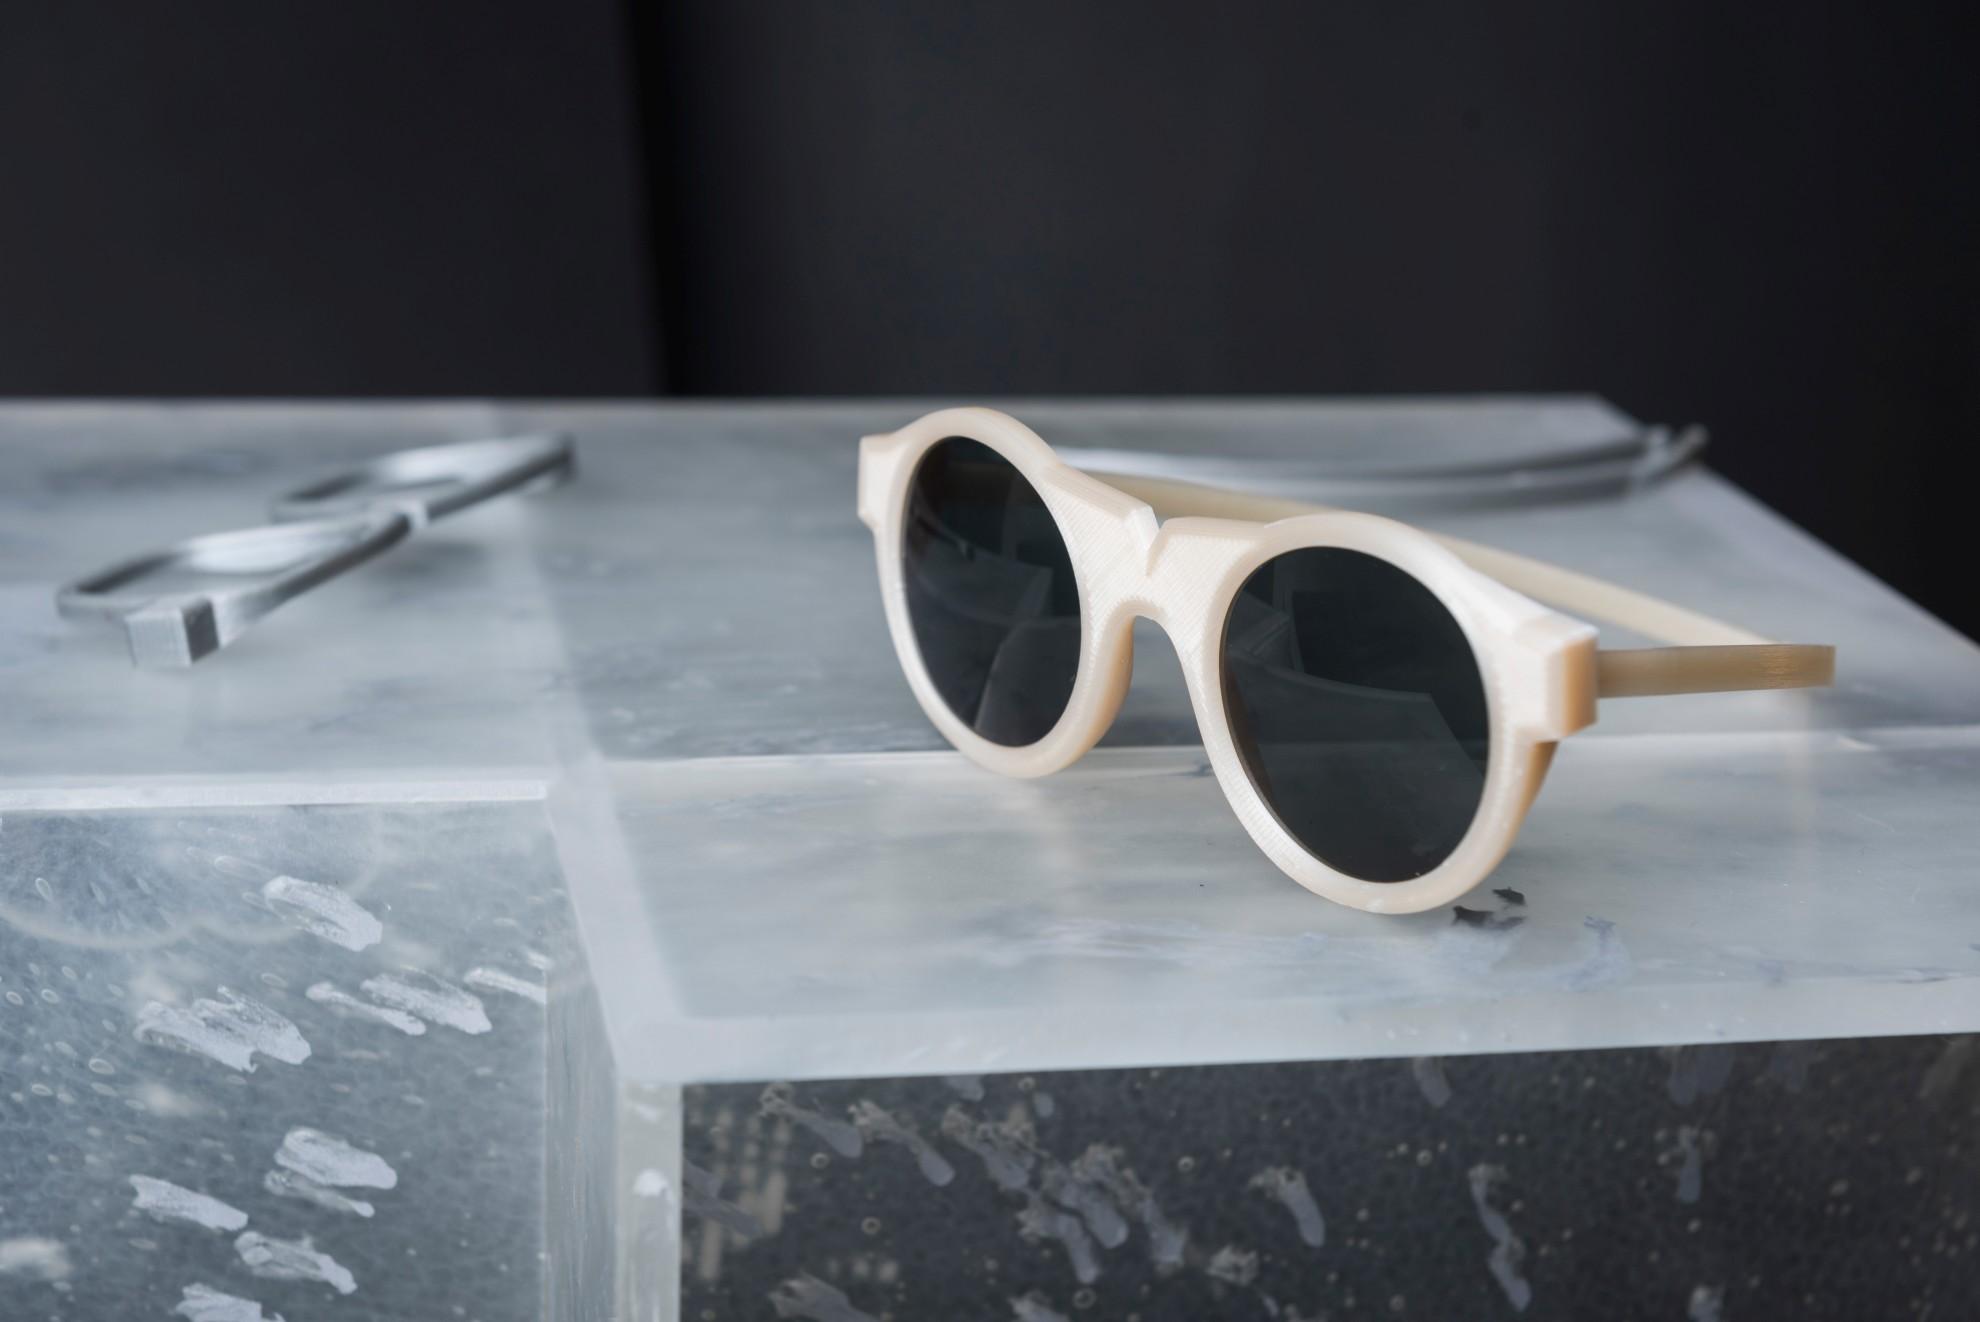 Das Craftic Plastics Studio stellt unter anderem Brillen aus Nuatan her. (Foto: Adam Sakovy)